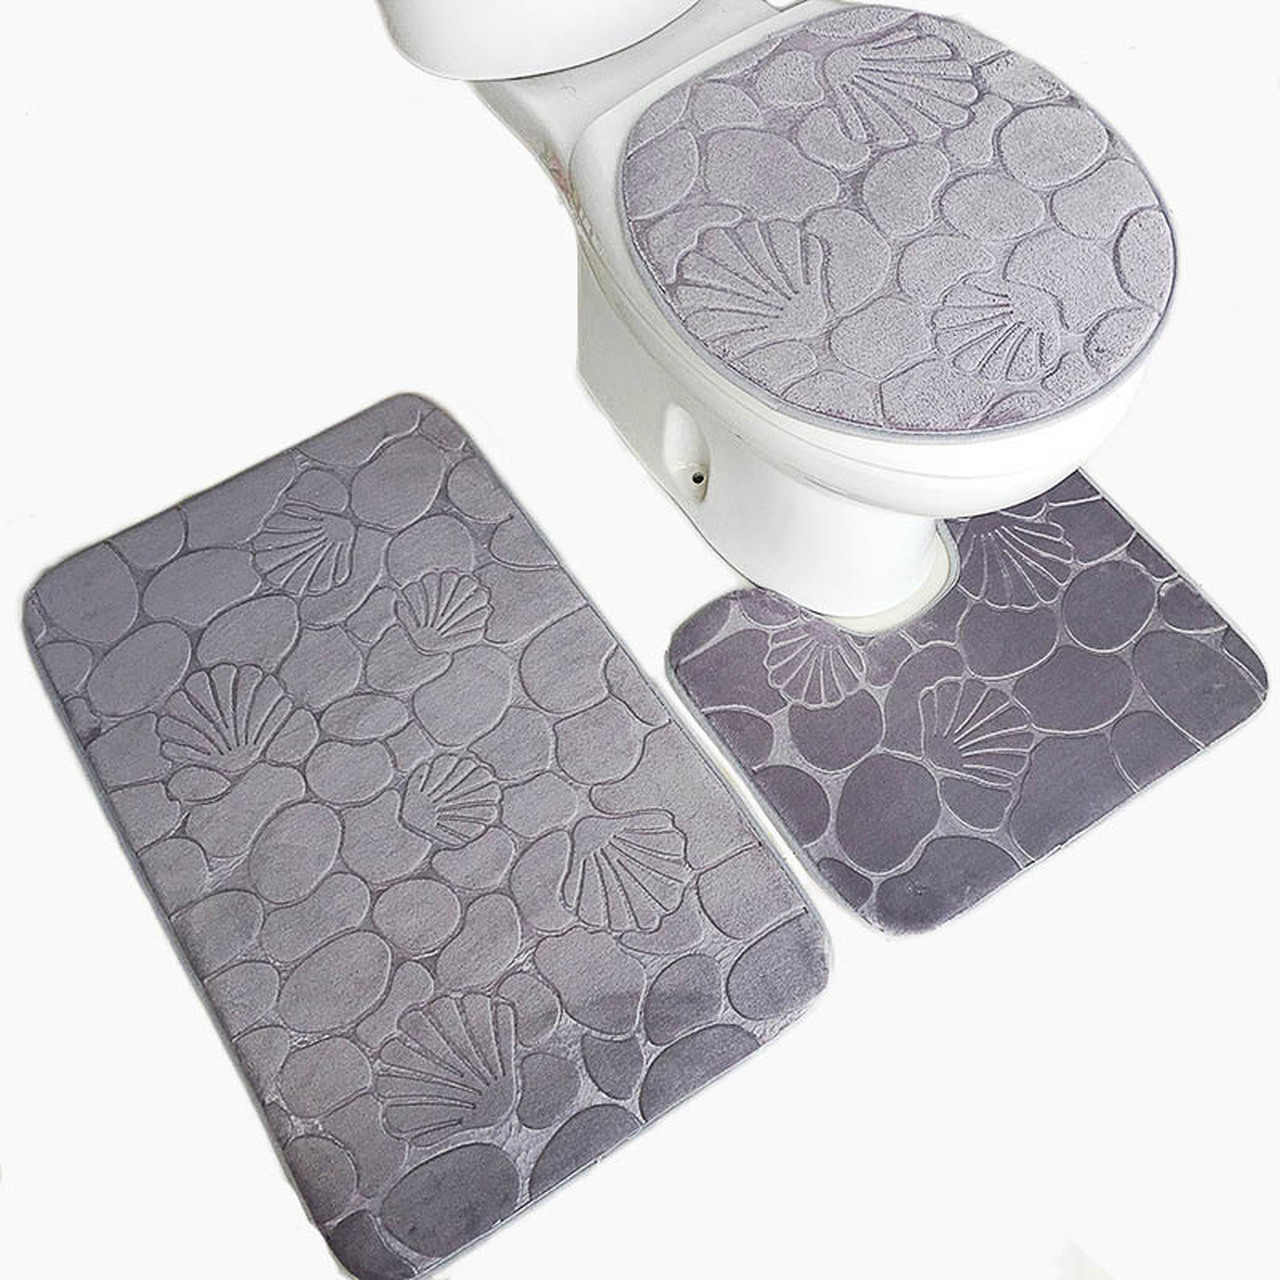 Anti-slip Bath Mats Set Coral Fleece Absorb Bathroom Carpet Pedestal Lid US NEW